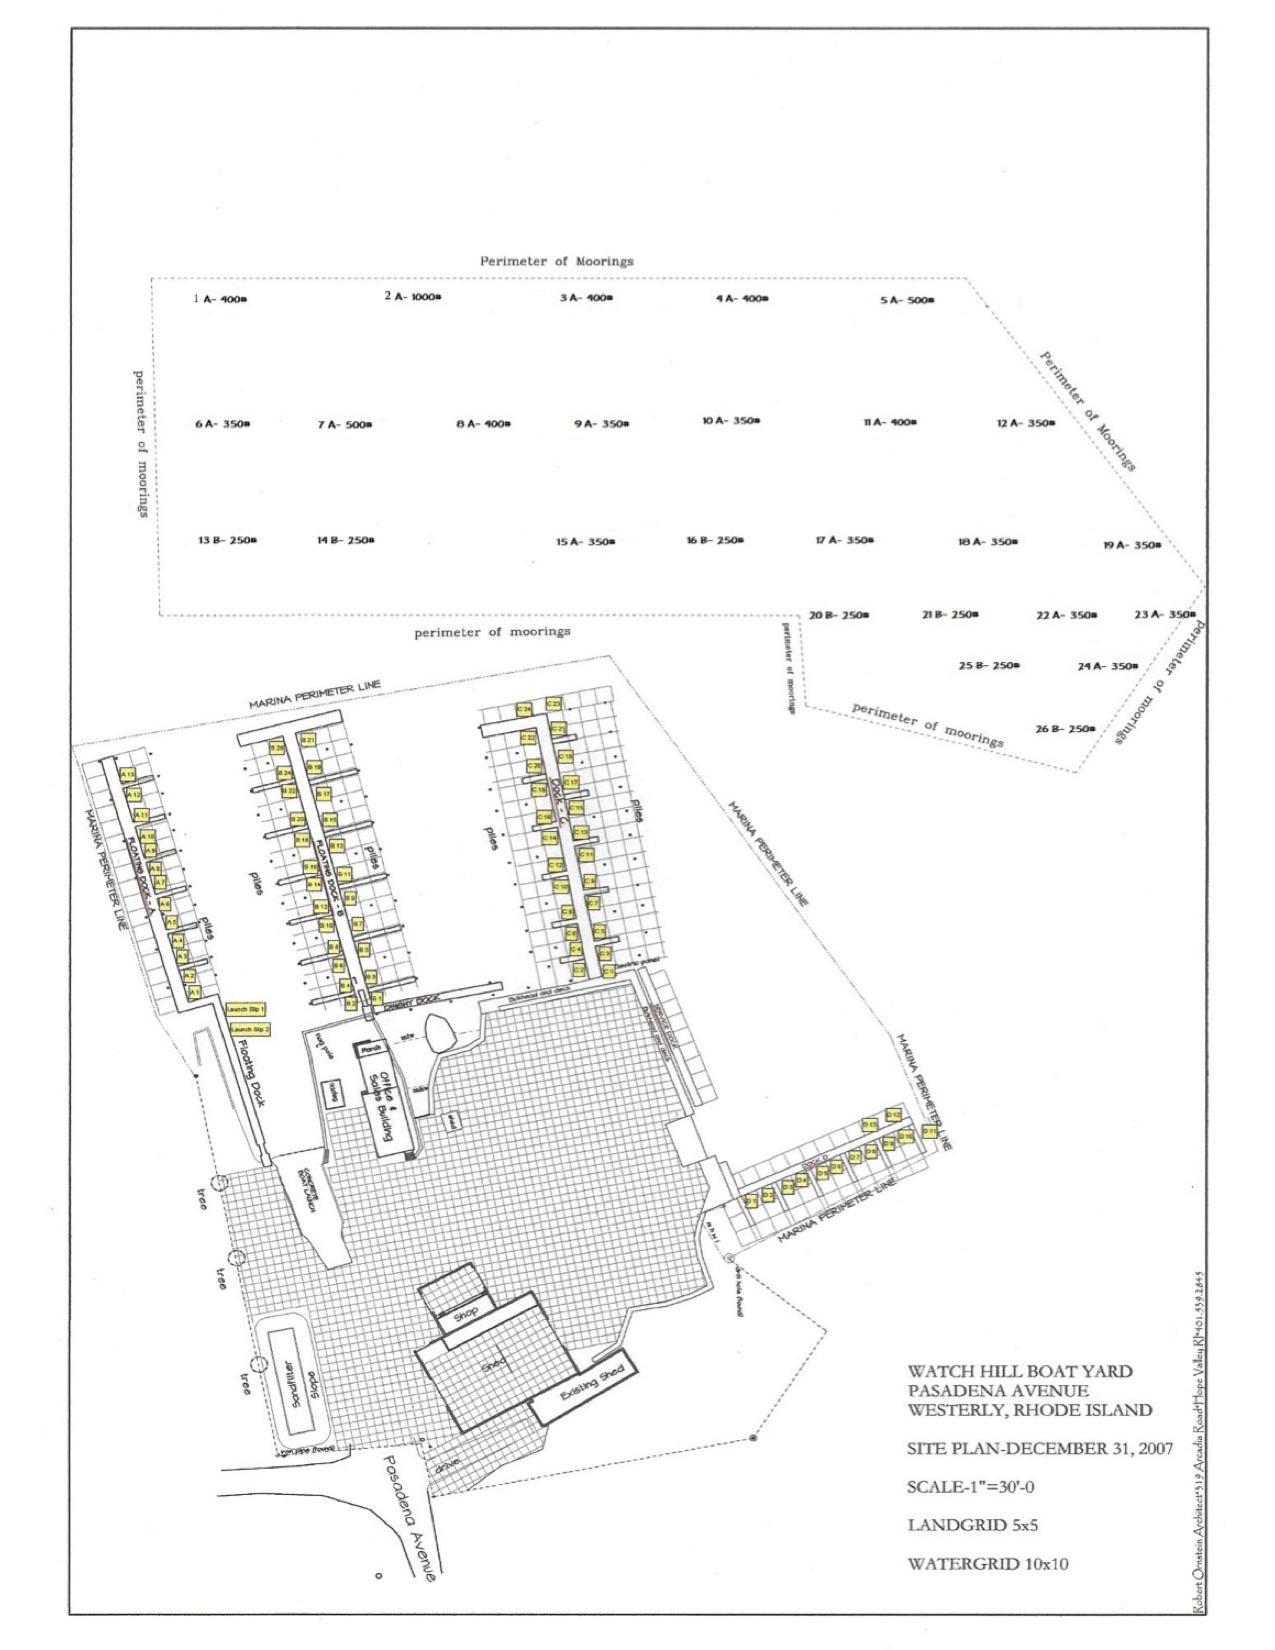 watch-hill-boat-yard-dock-chart-1 (1)